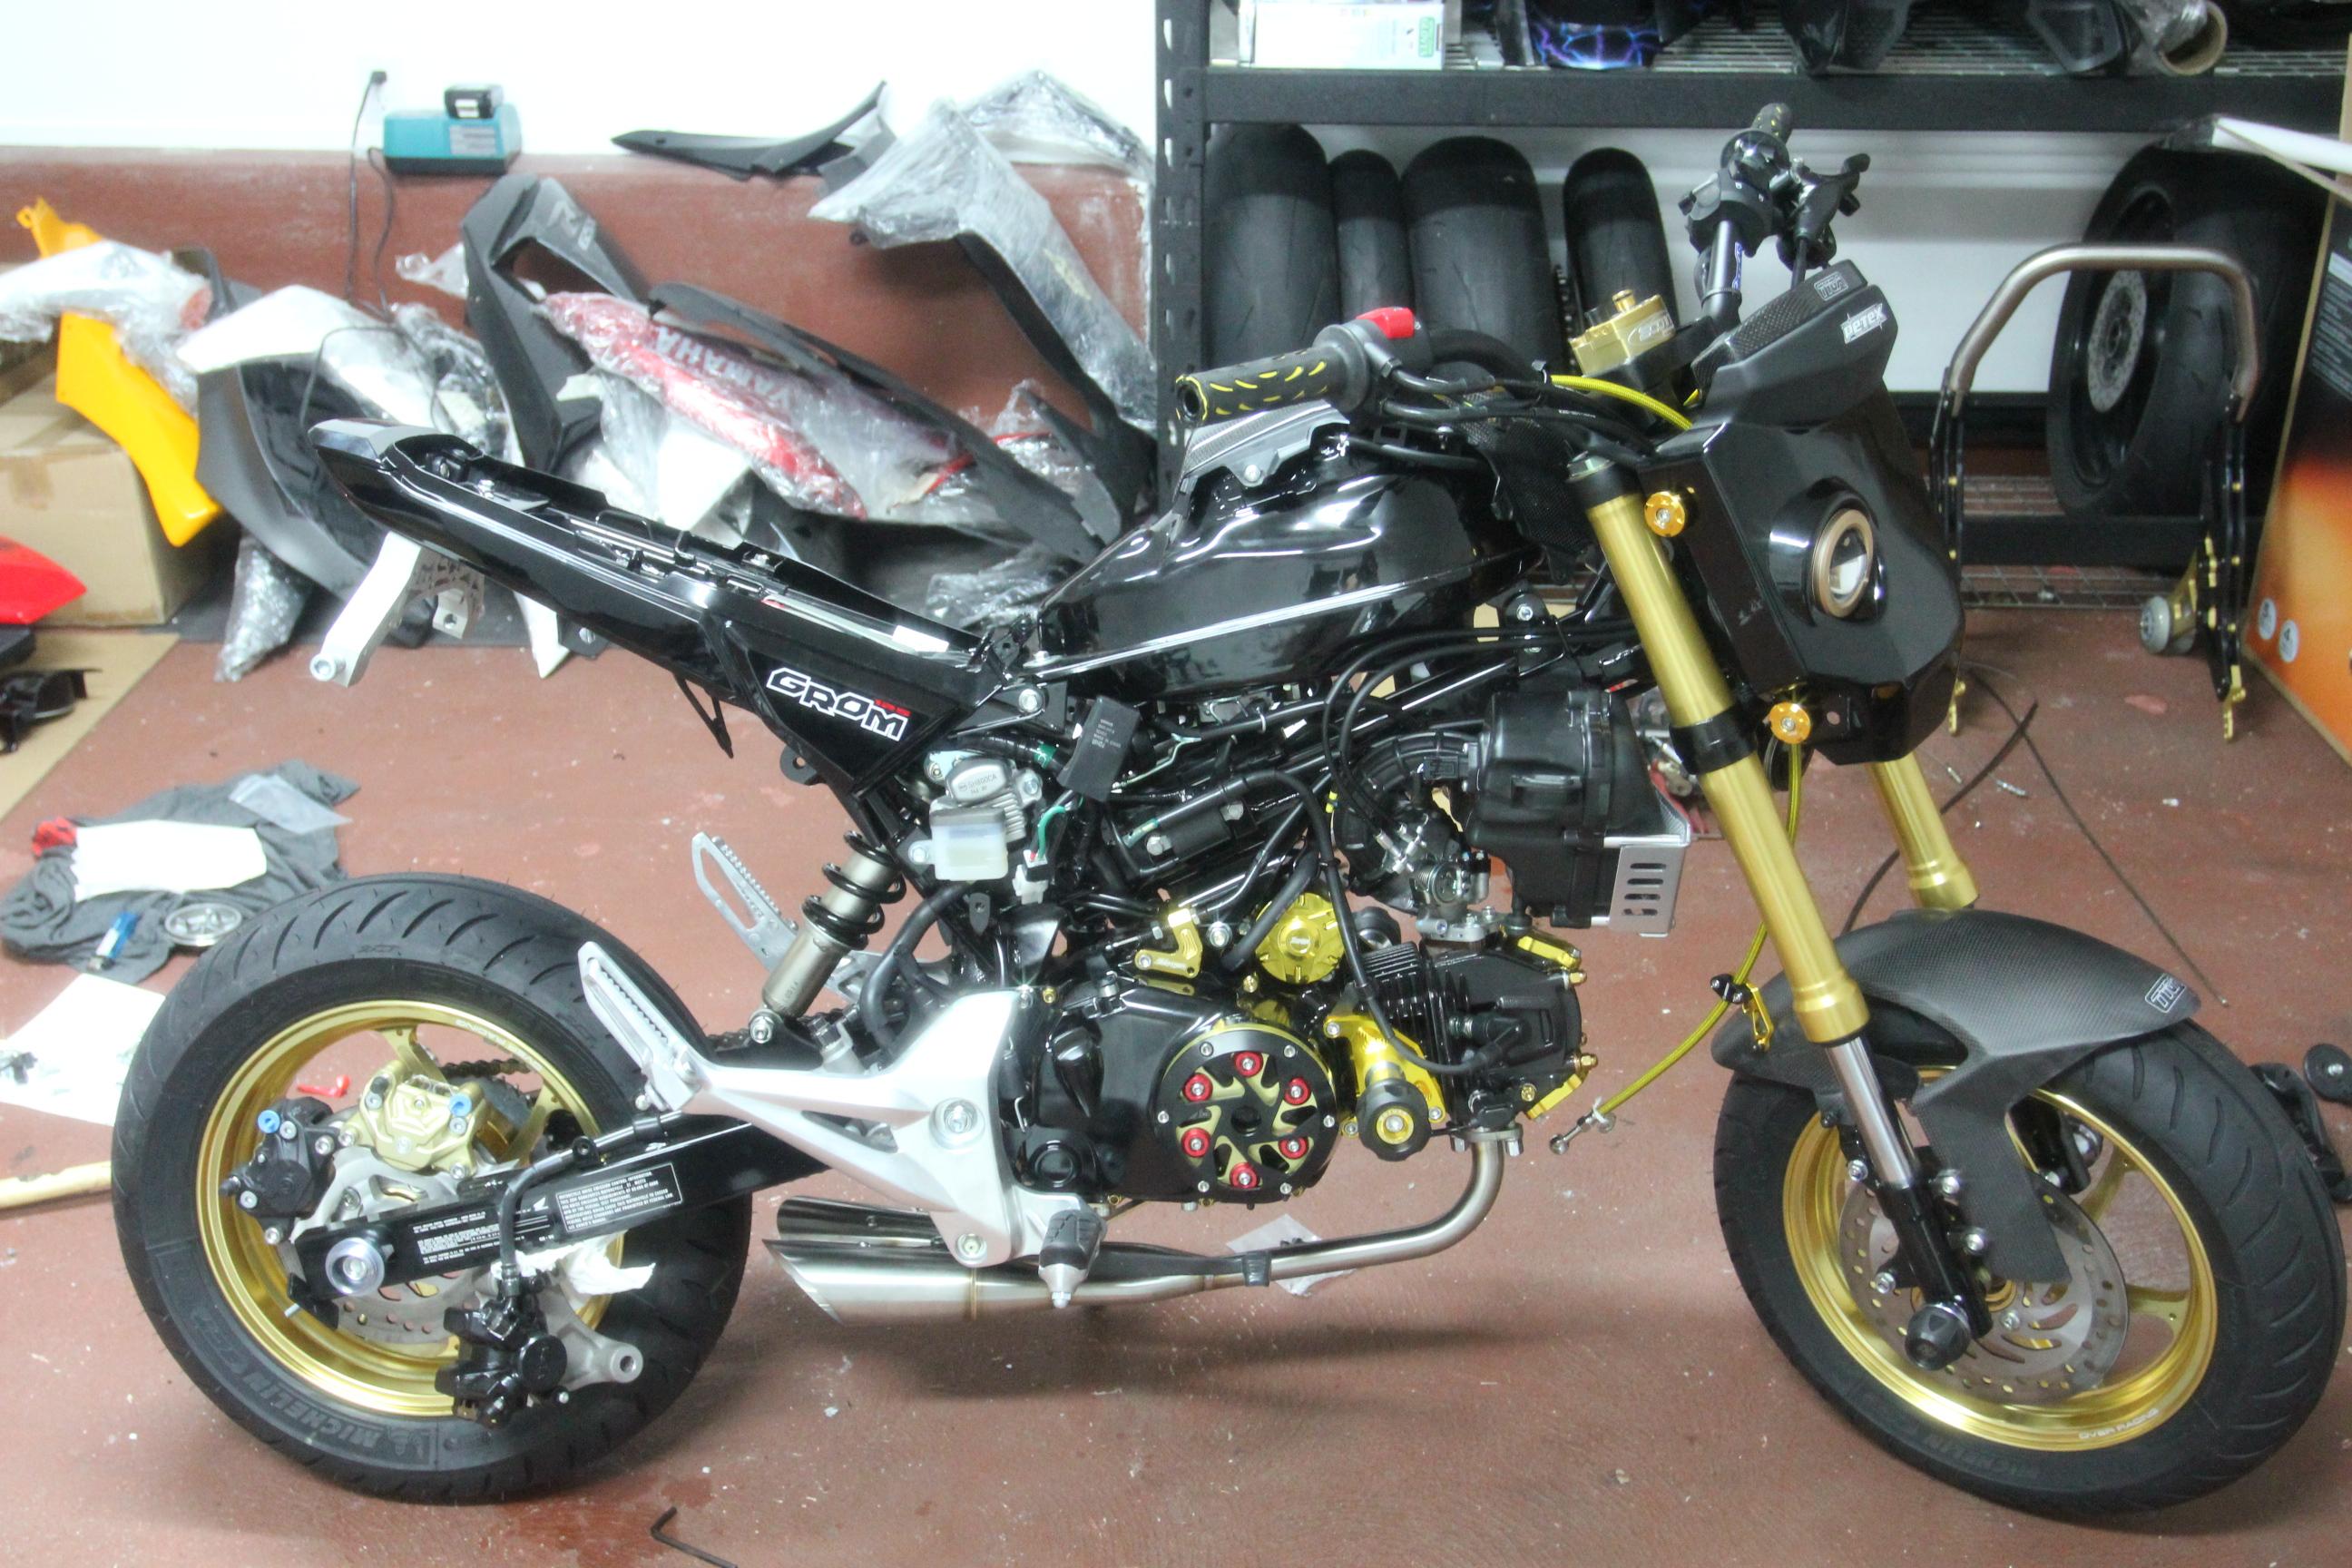 Honda Grom Stunt Bike For Sale Off 61 Www Abrafiltros Org Br